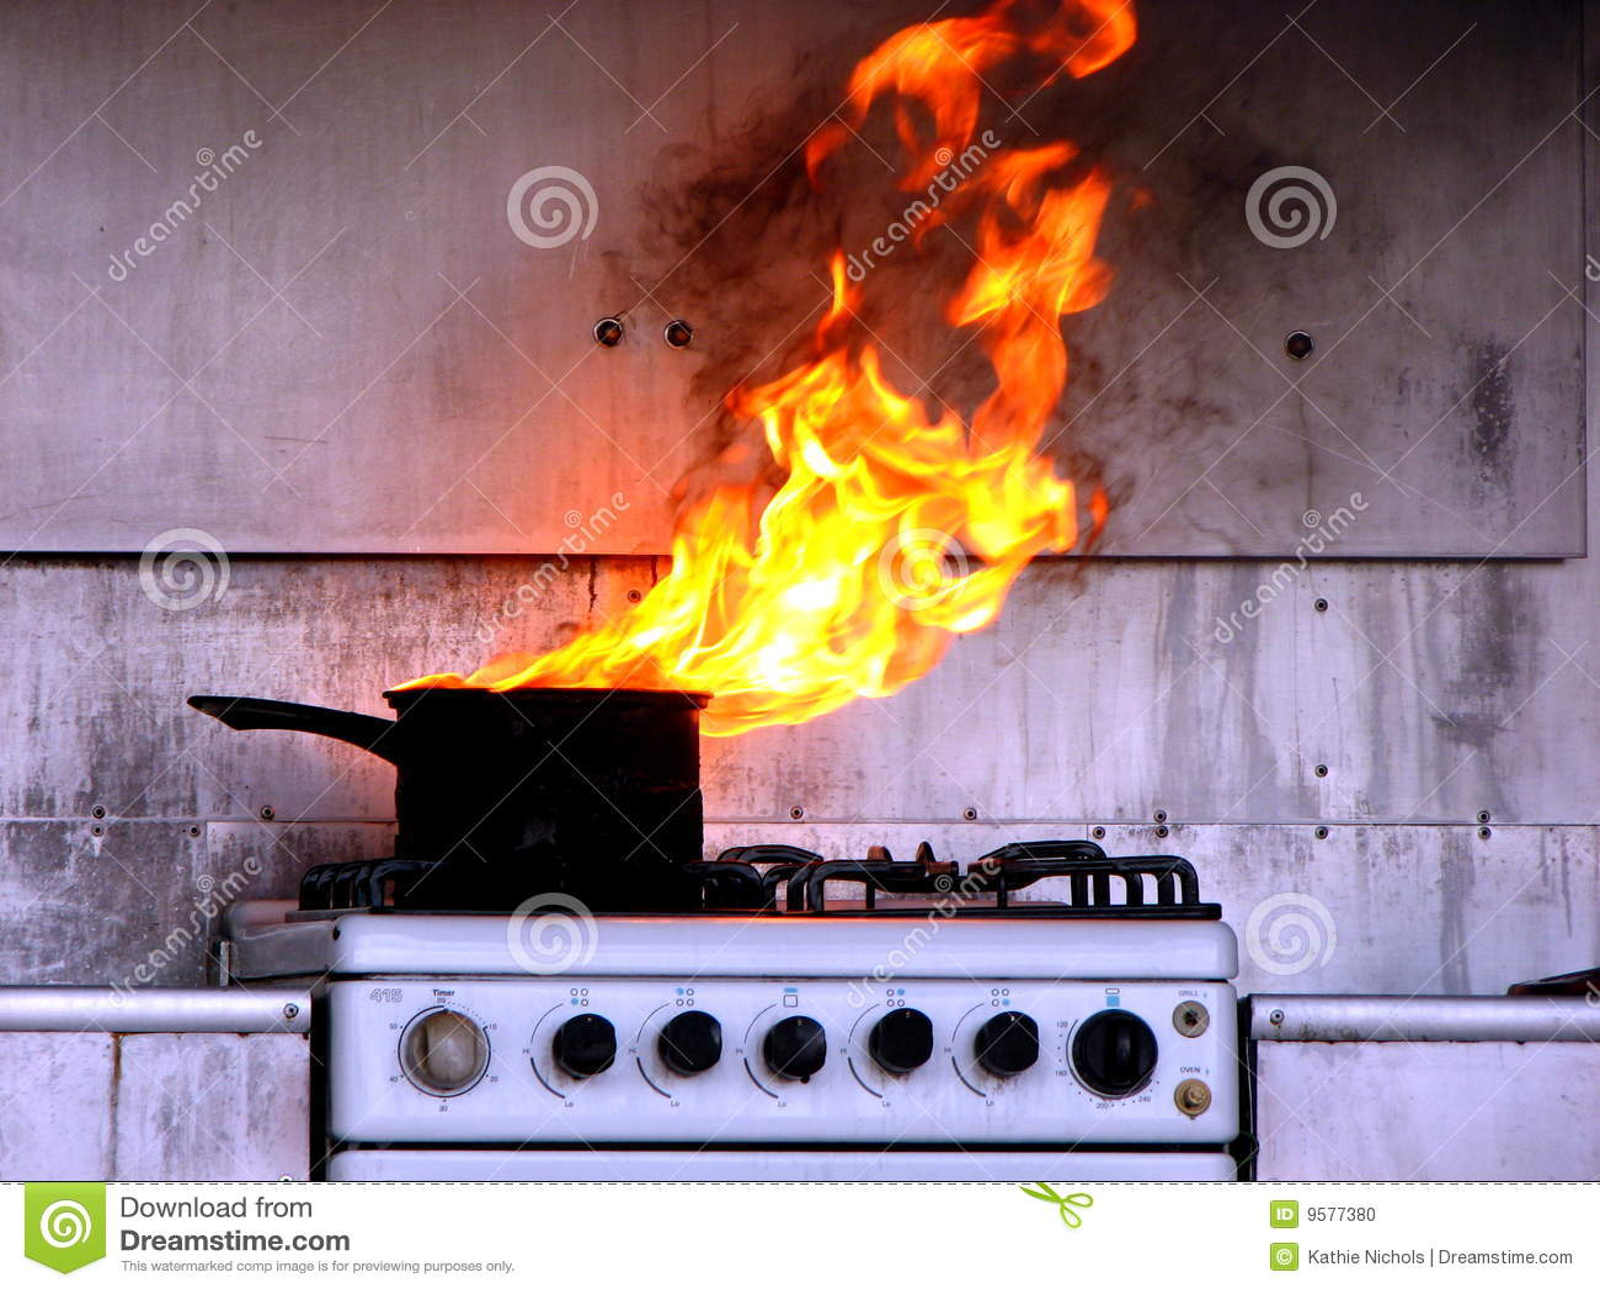 Hot Oil Fire in Kitchen